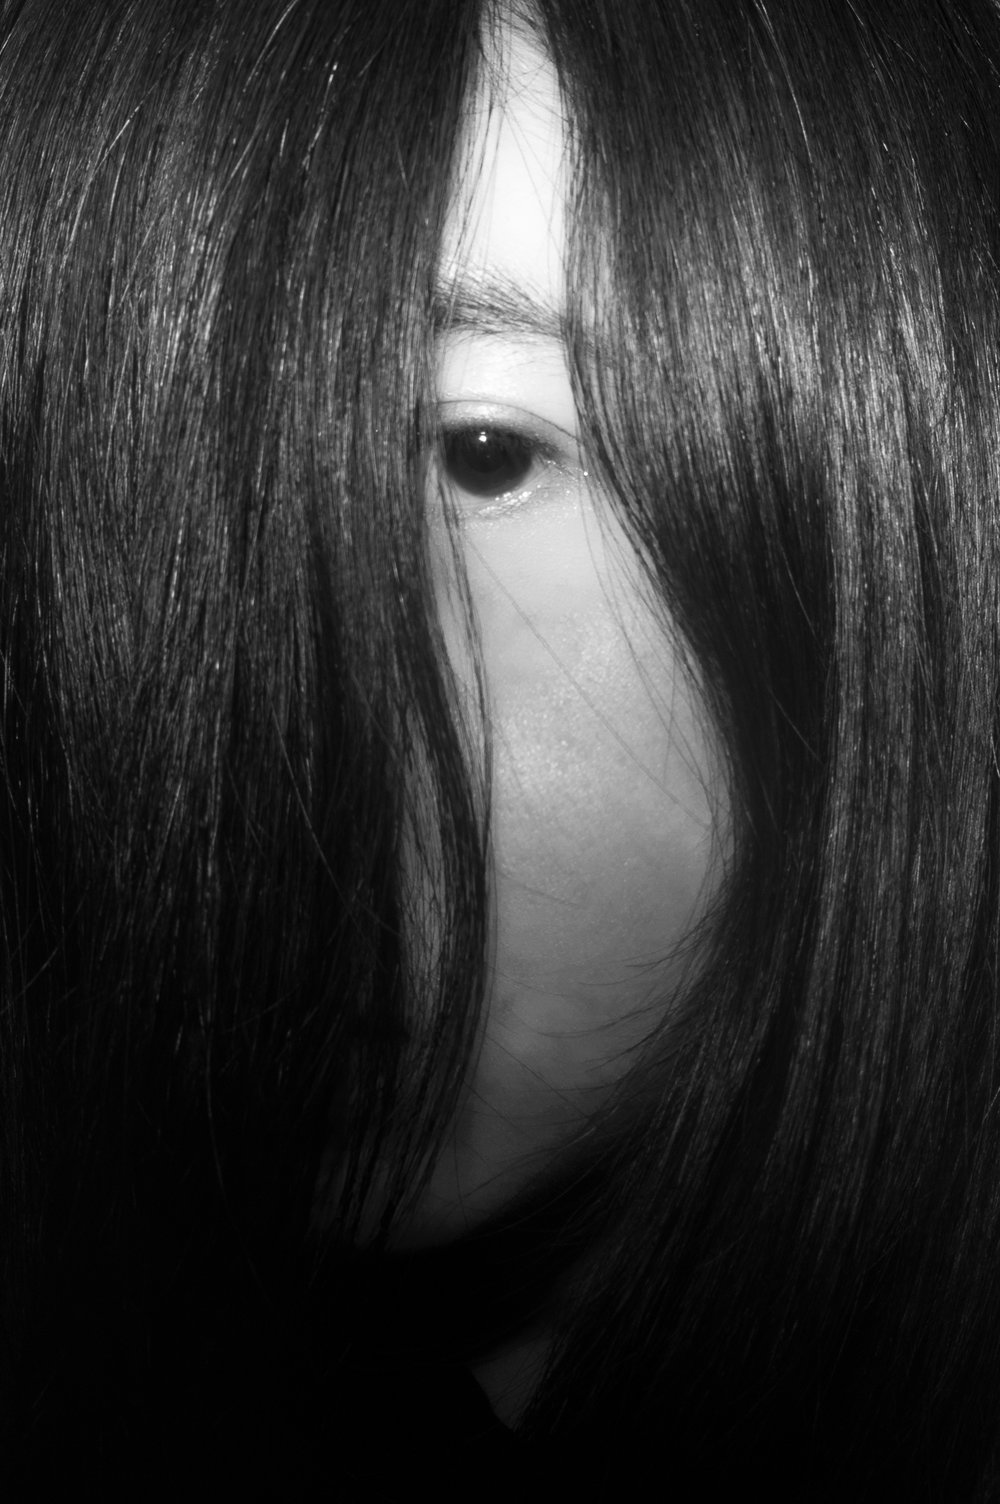 Lau_170112_0023231.jpg